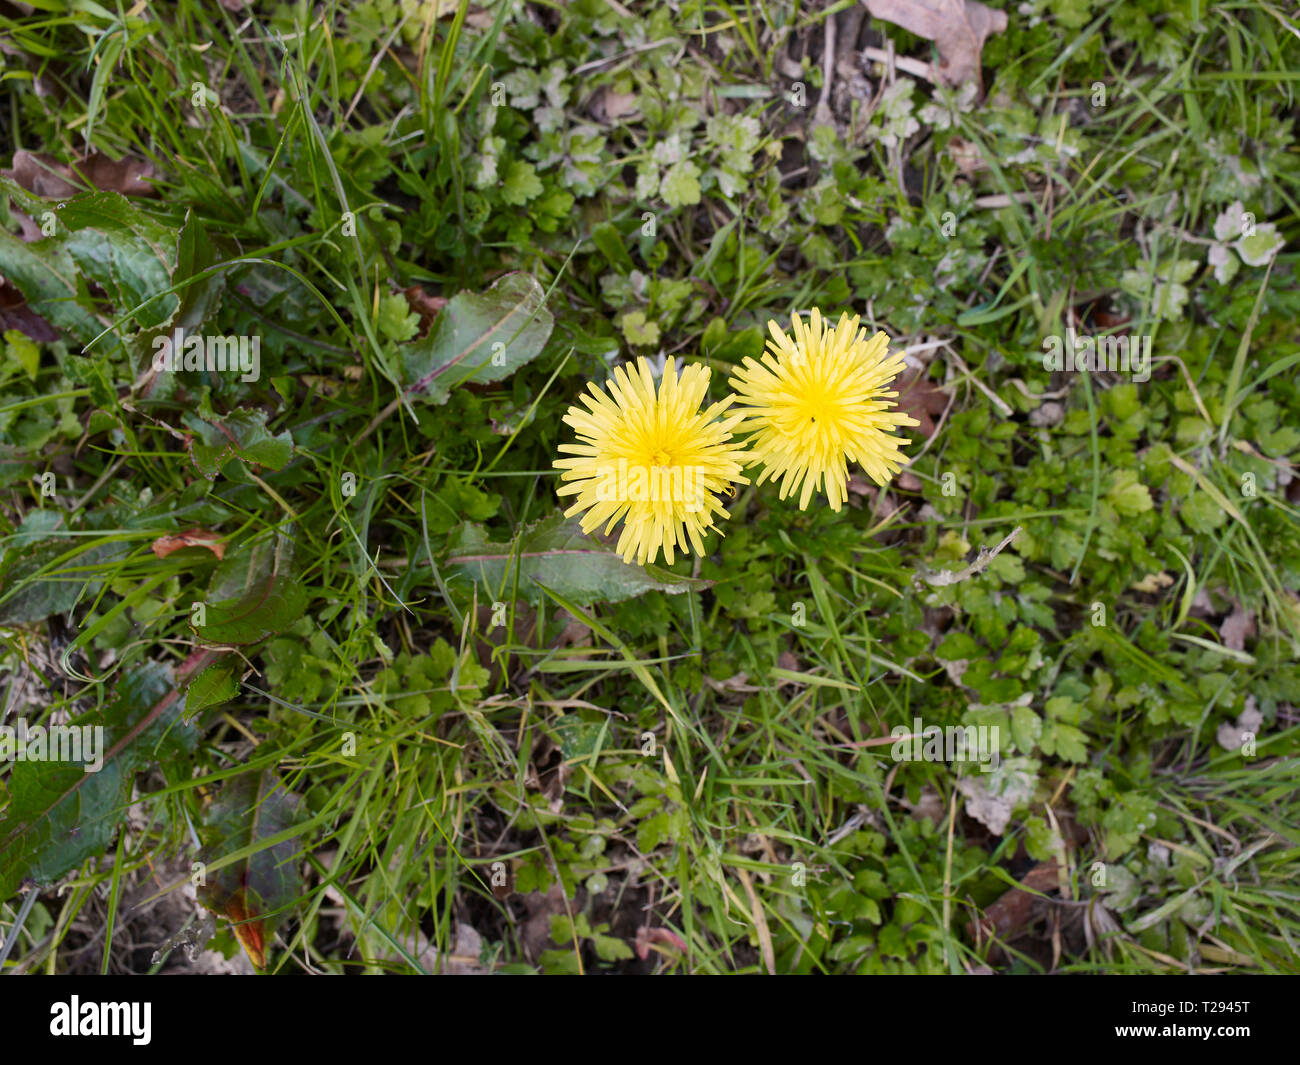 Two spring dandelions in grassland flowering - Stock Image